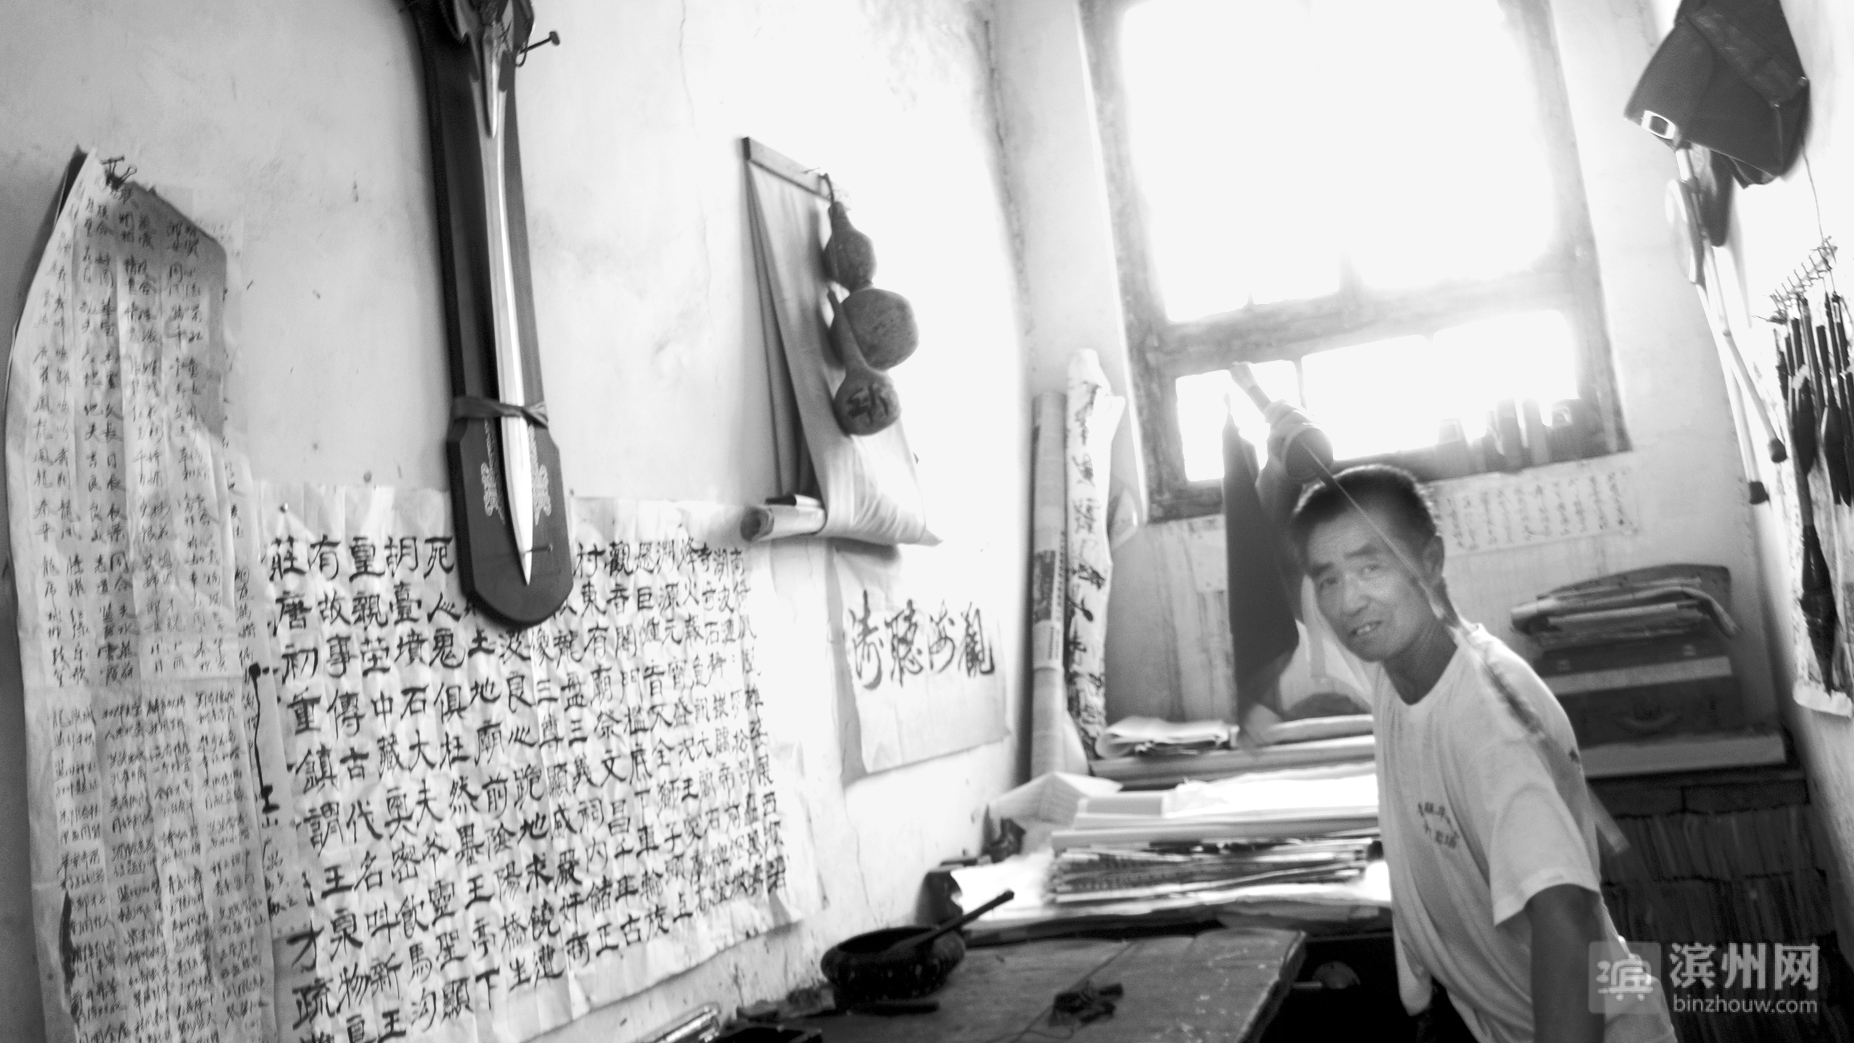 C:\fakepath\王怀信老人文武双全,继承着青阳村古老的人文、武术传统.JPG